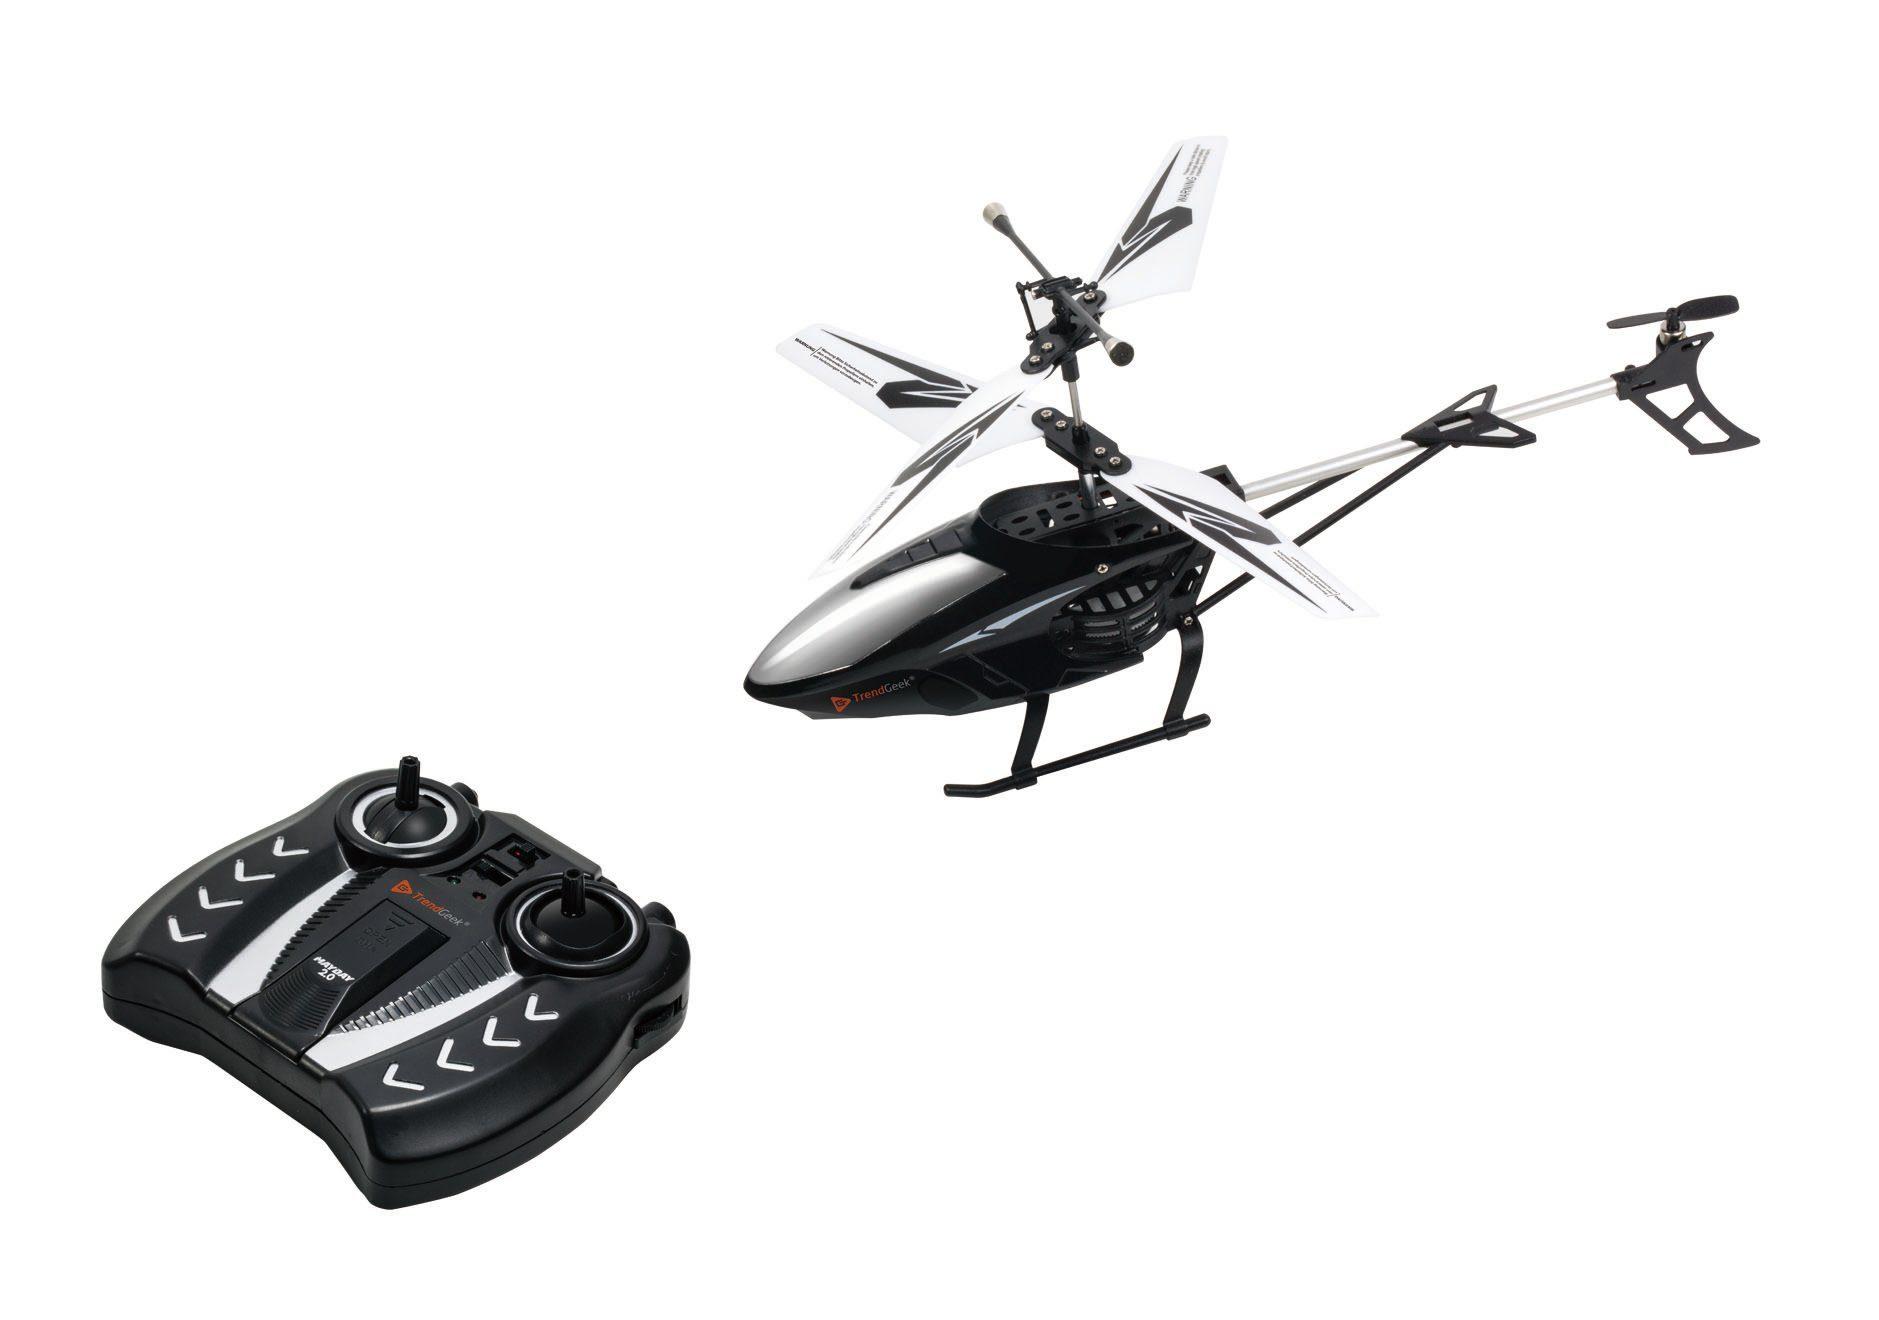 Technaxx Drone »TrendGeek RC Helikopter 3.5-Kanal TG-003«